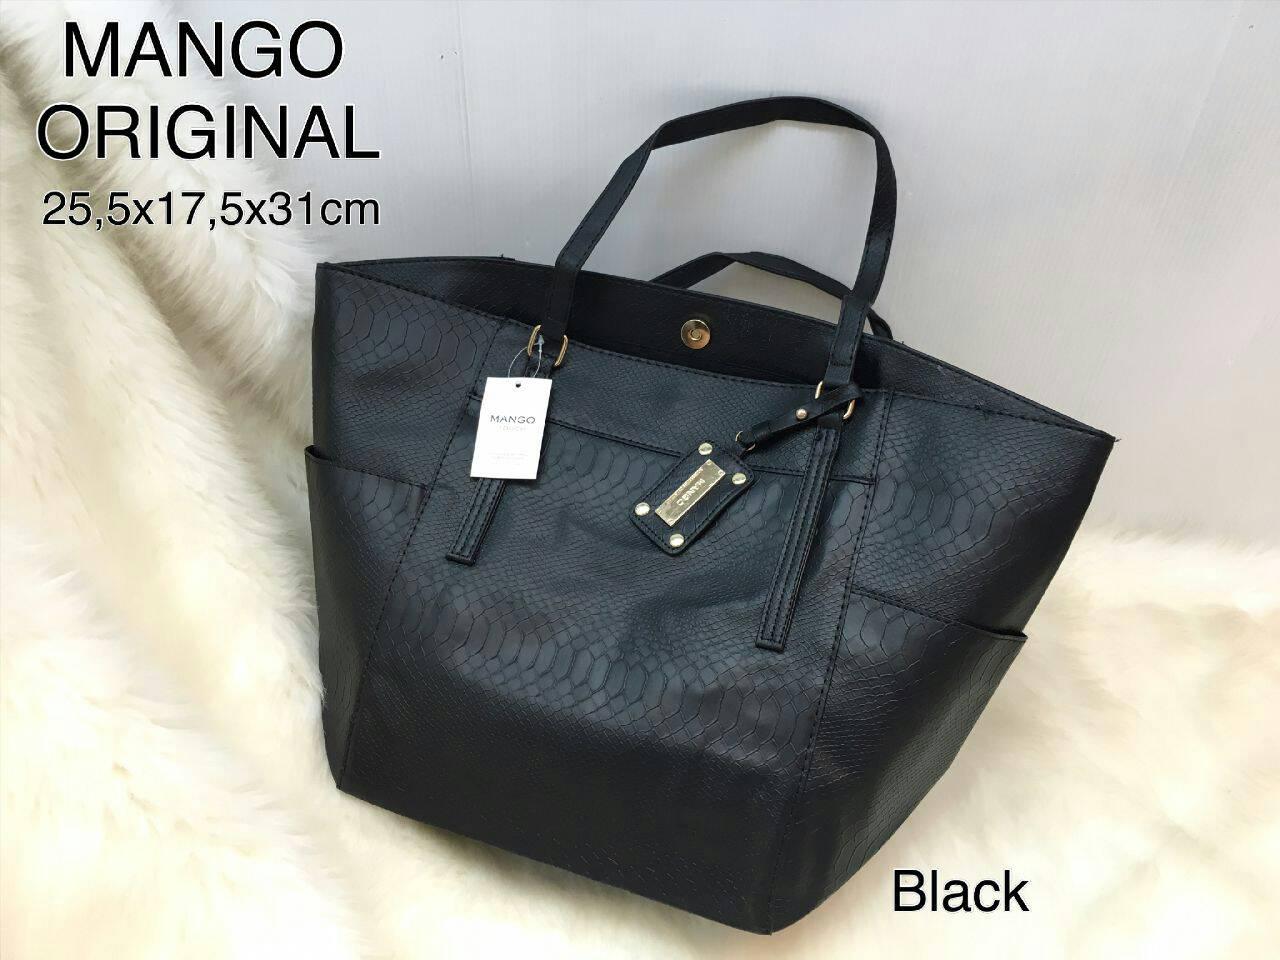 Jual Tas Mango Original Black Navy Tenteng Handbag Tas Kantor Wanita